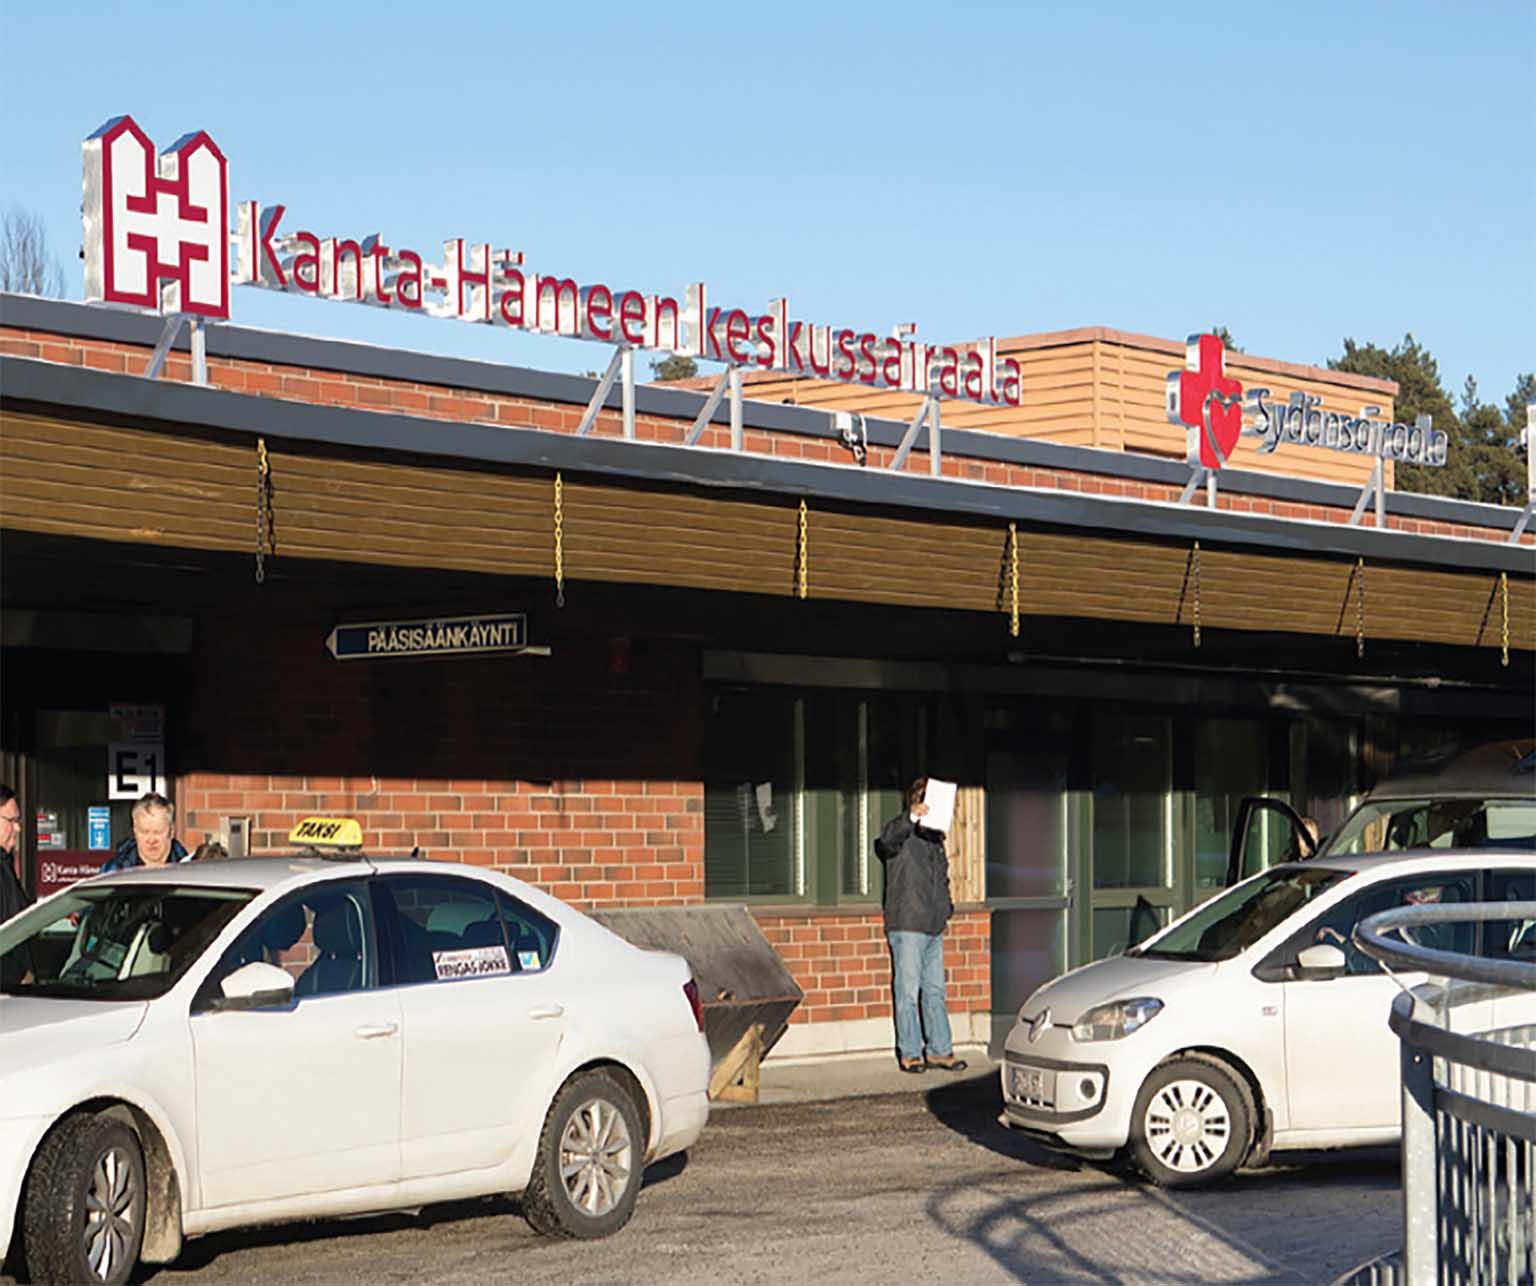 Kanta-Häme Central Hospital